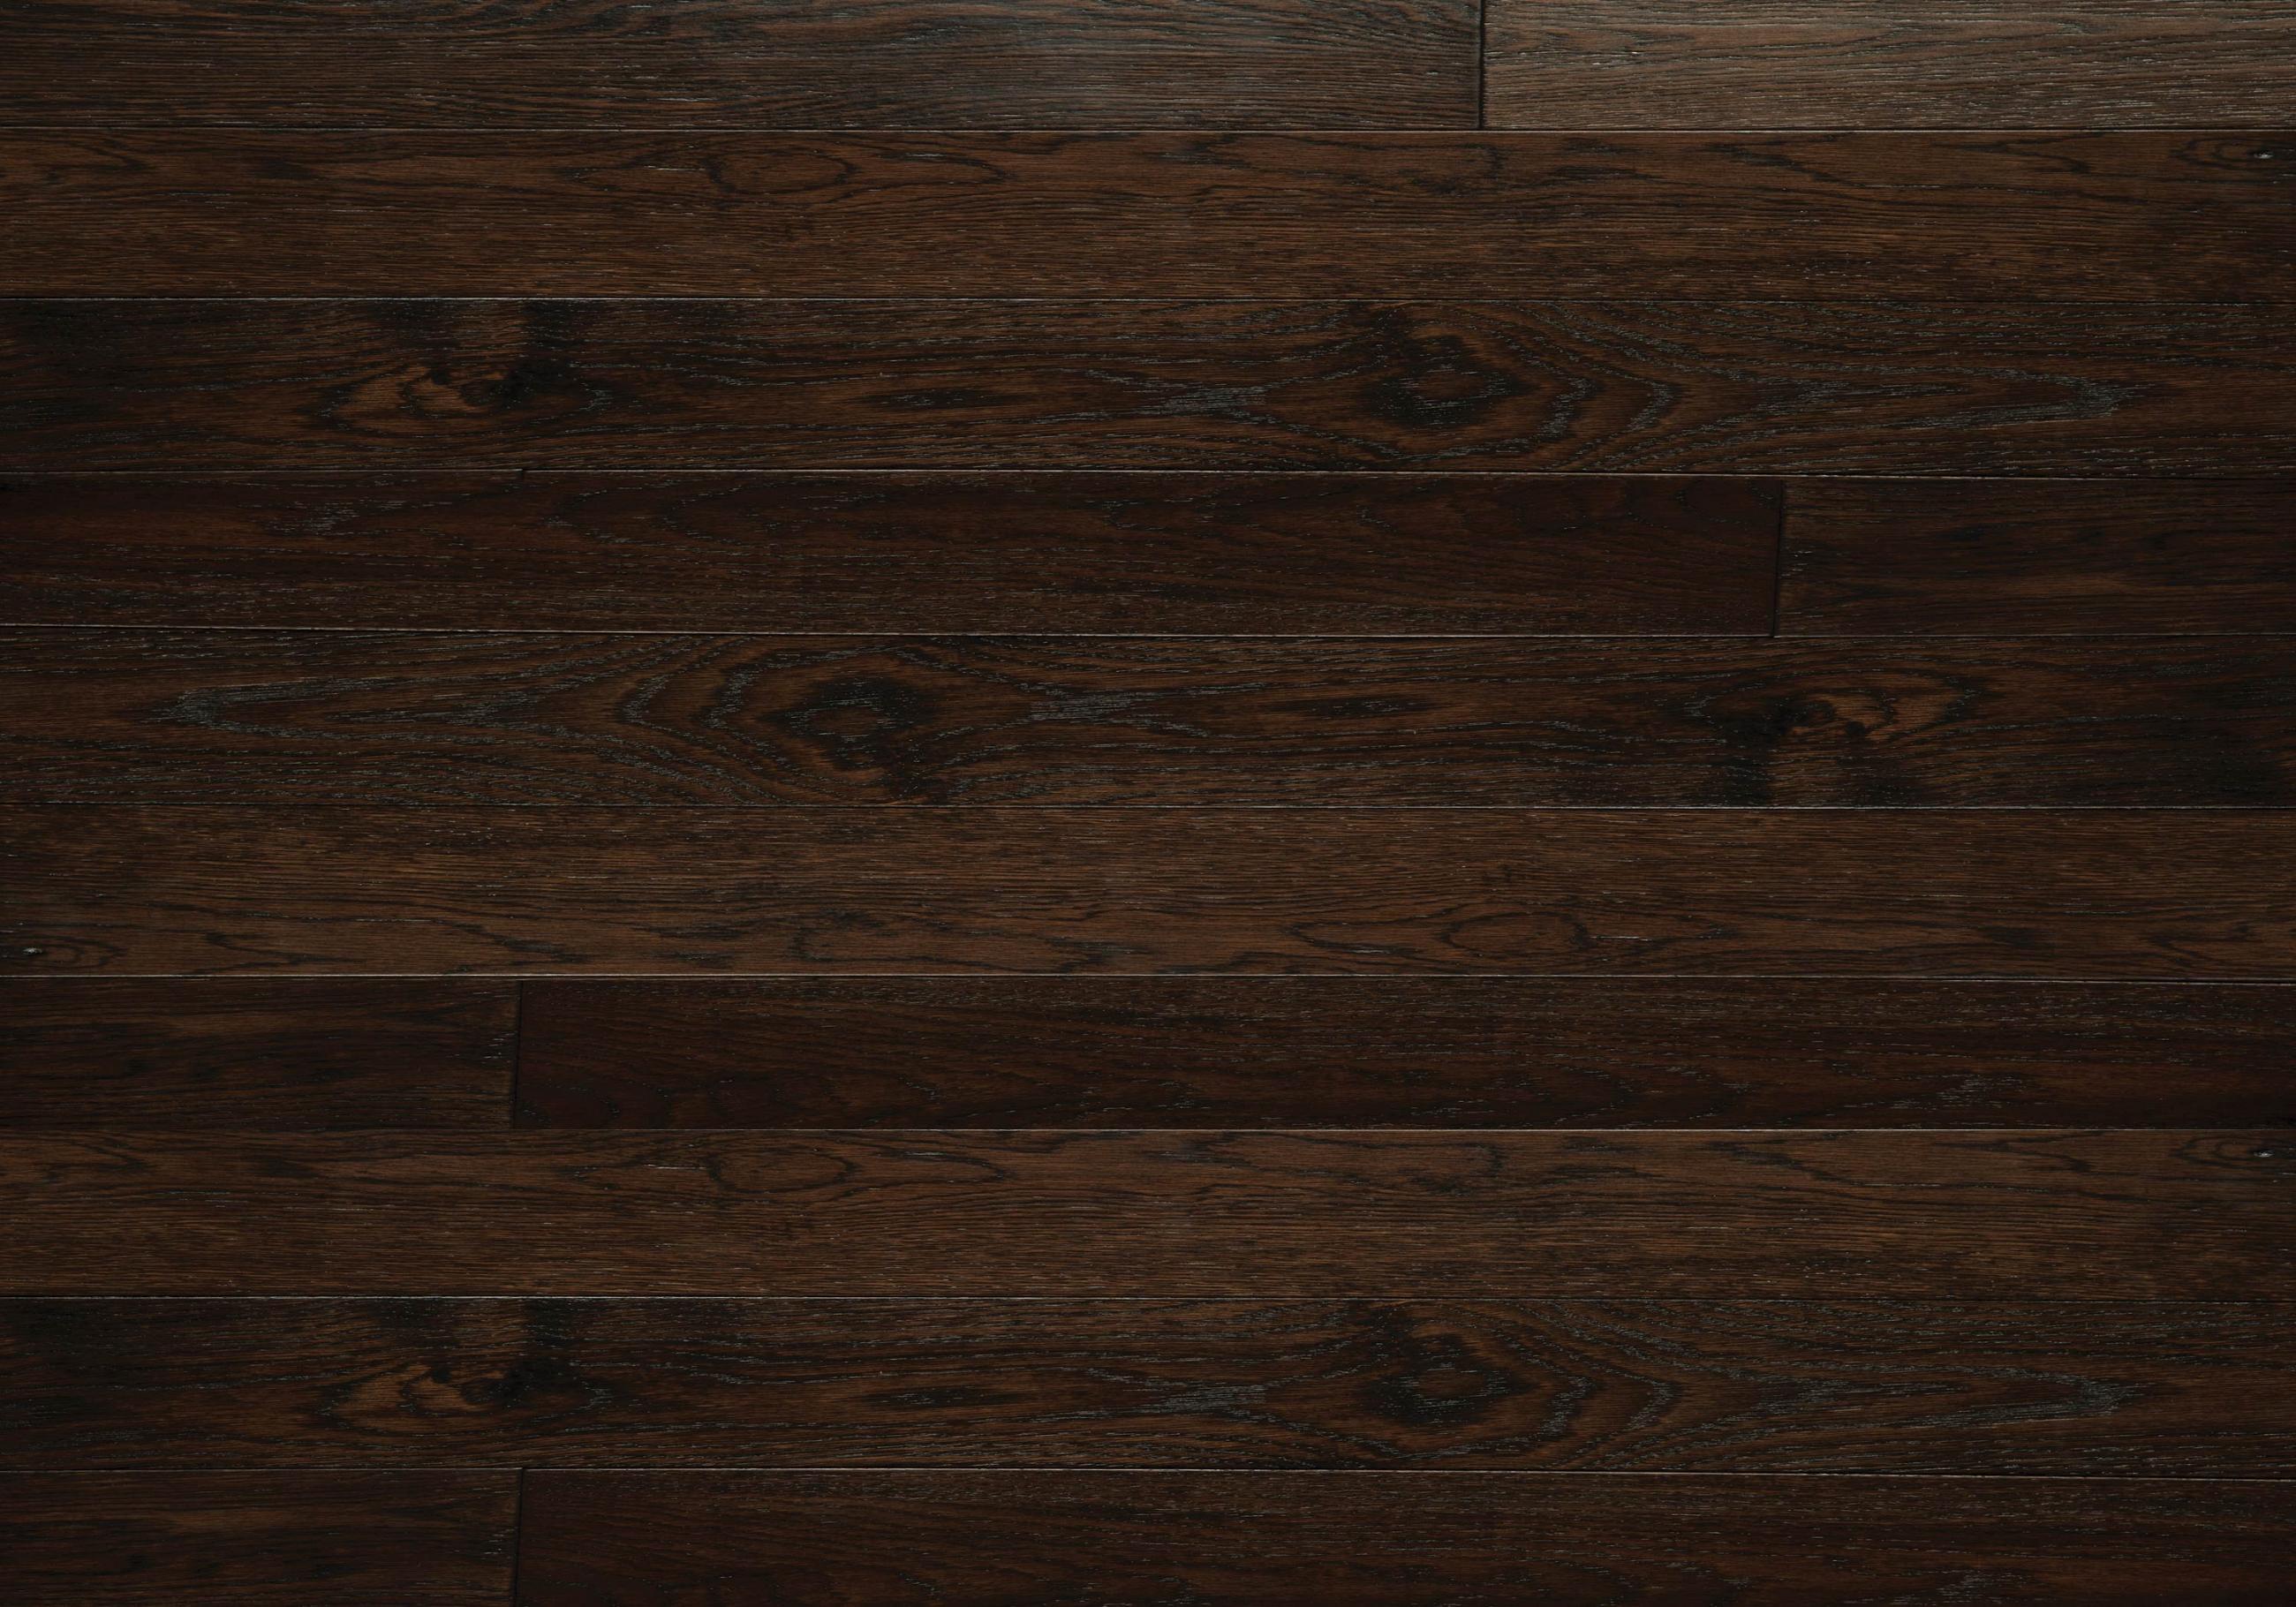 Dark Hardwood Floors Pros and Cons - HARDWOODS DESIGN